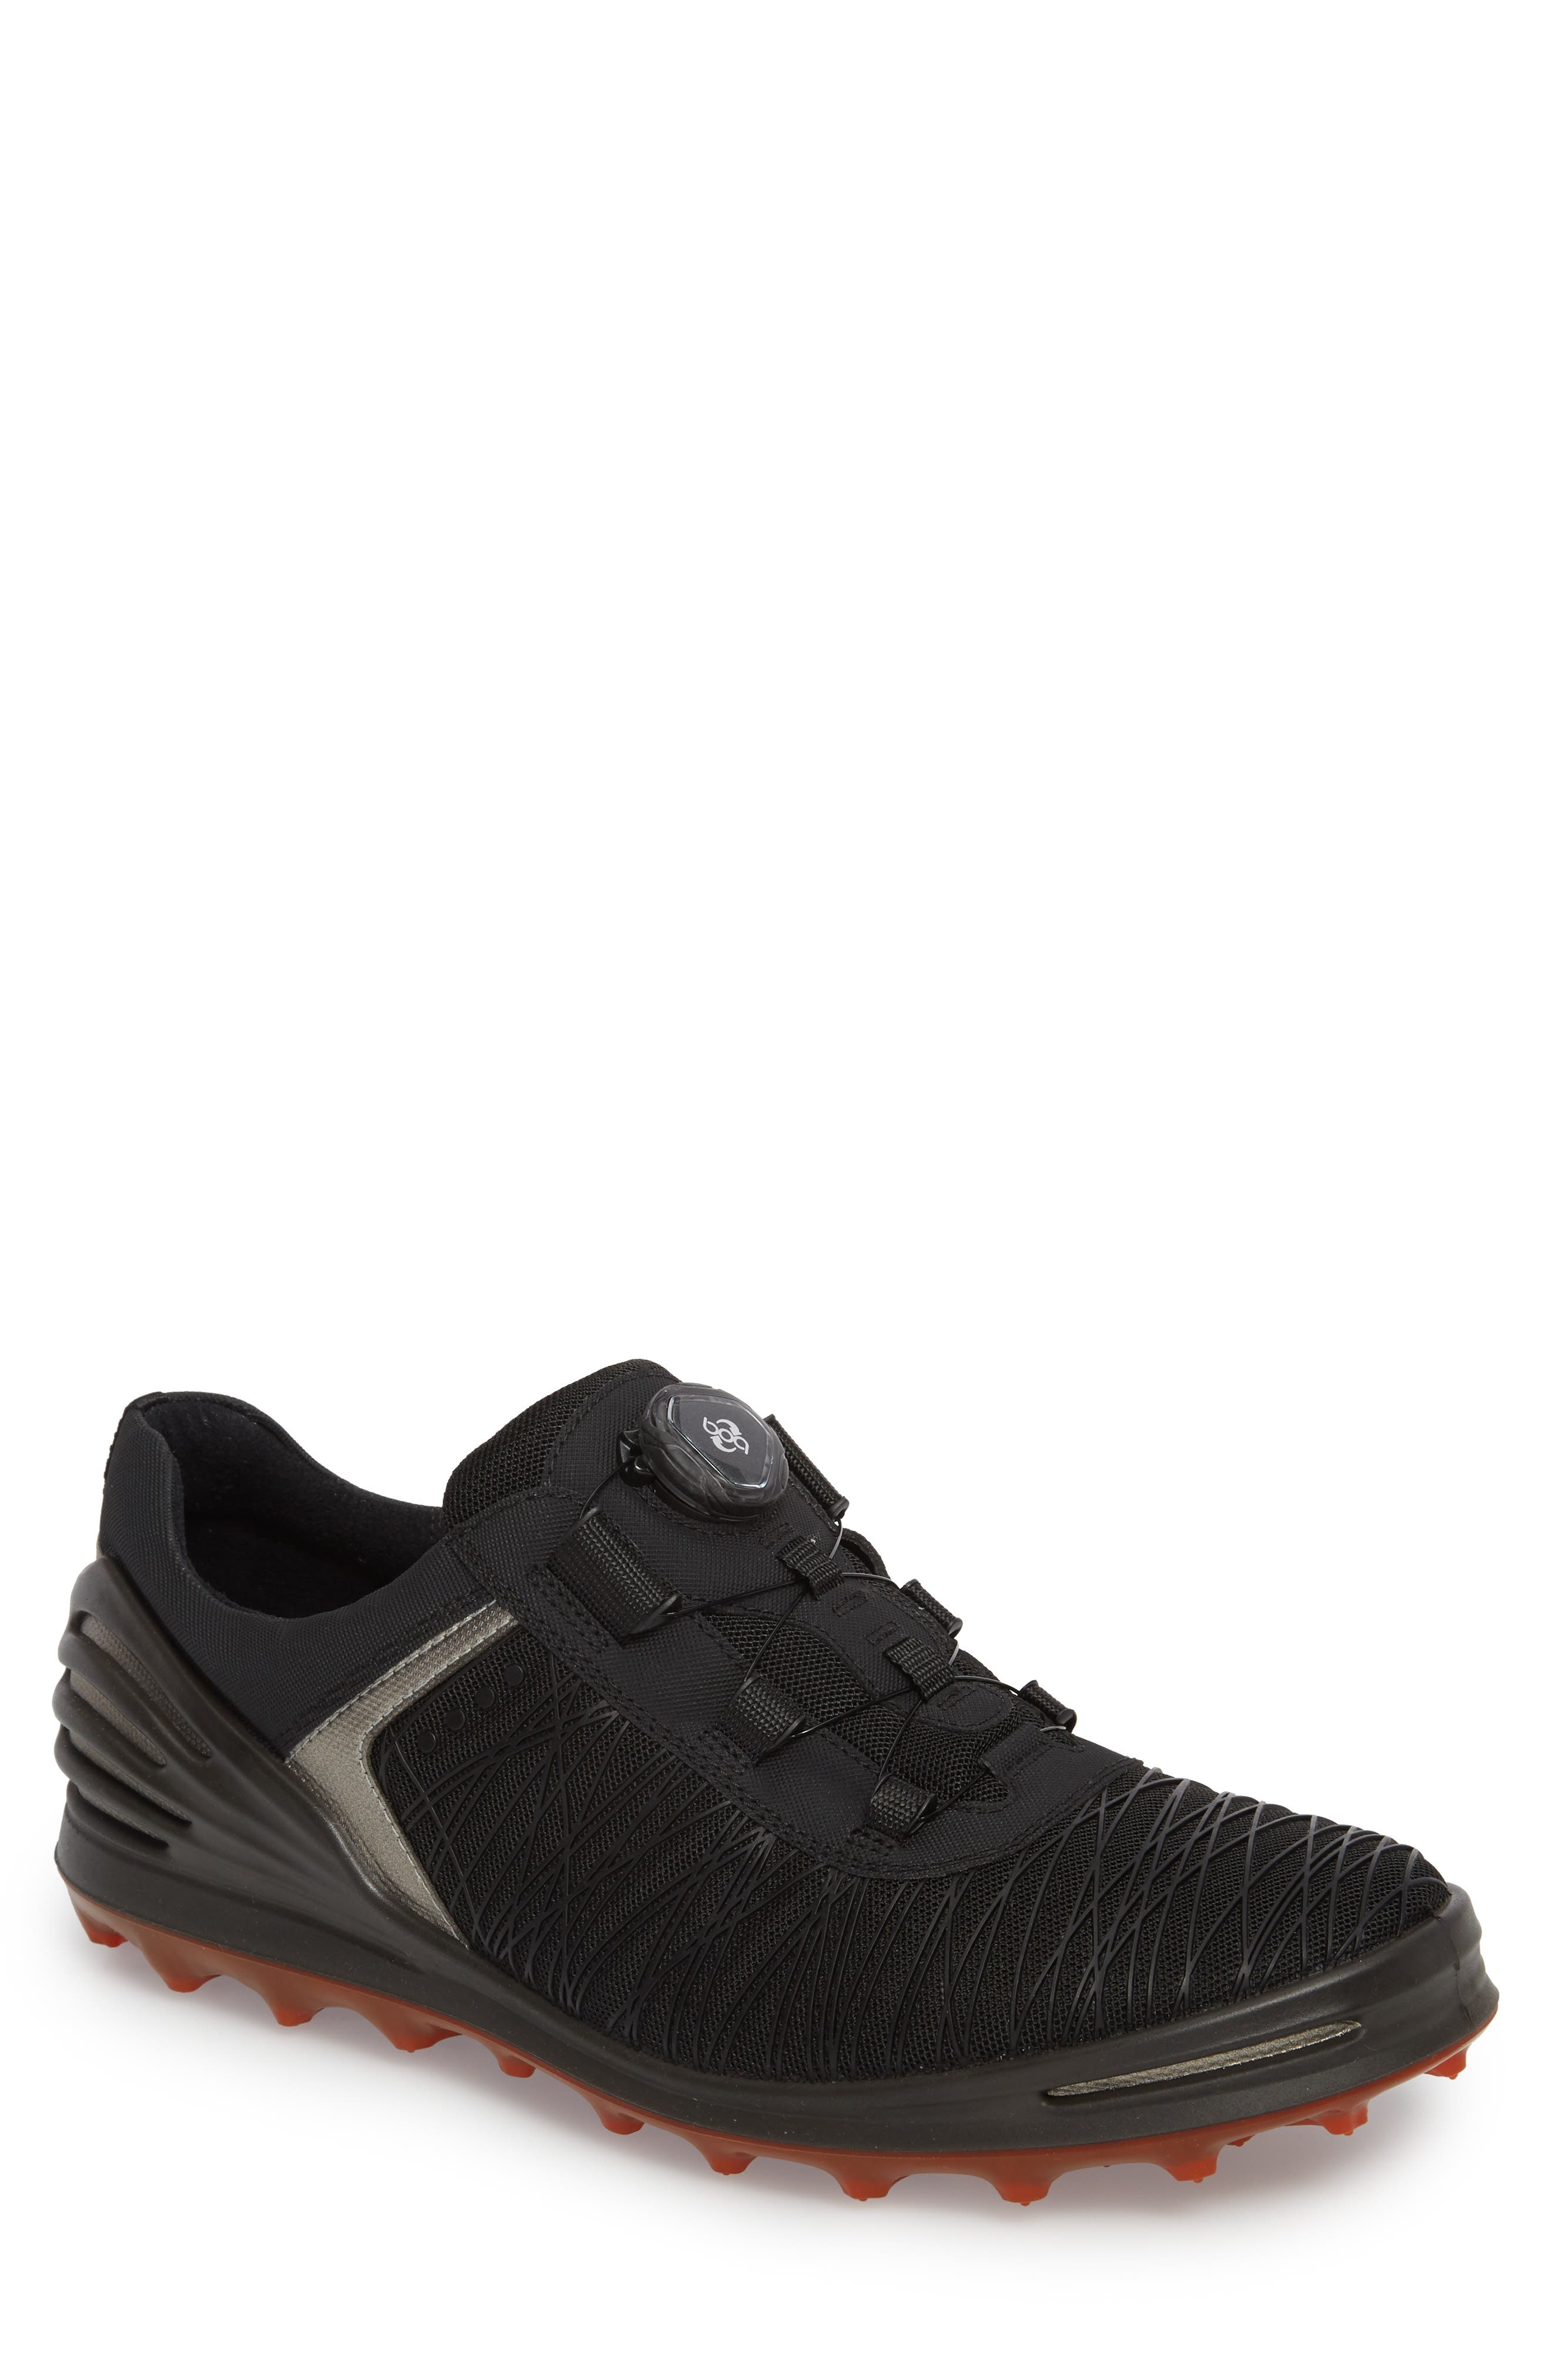 Cage Pro BOA Golf Shoe,                             Main thumbnail 1, color,                             Black